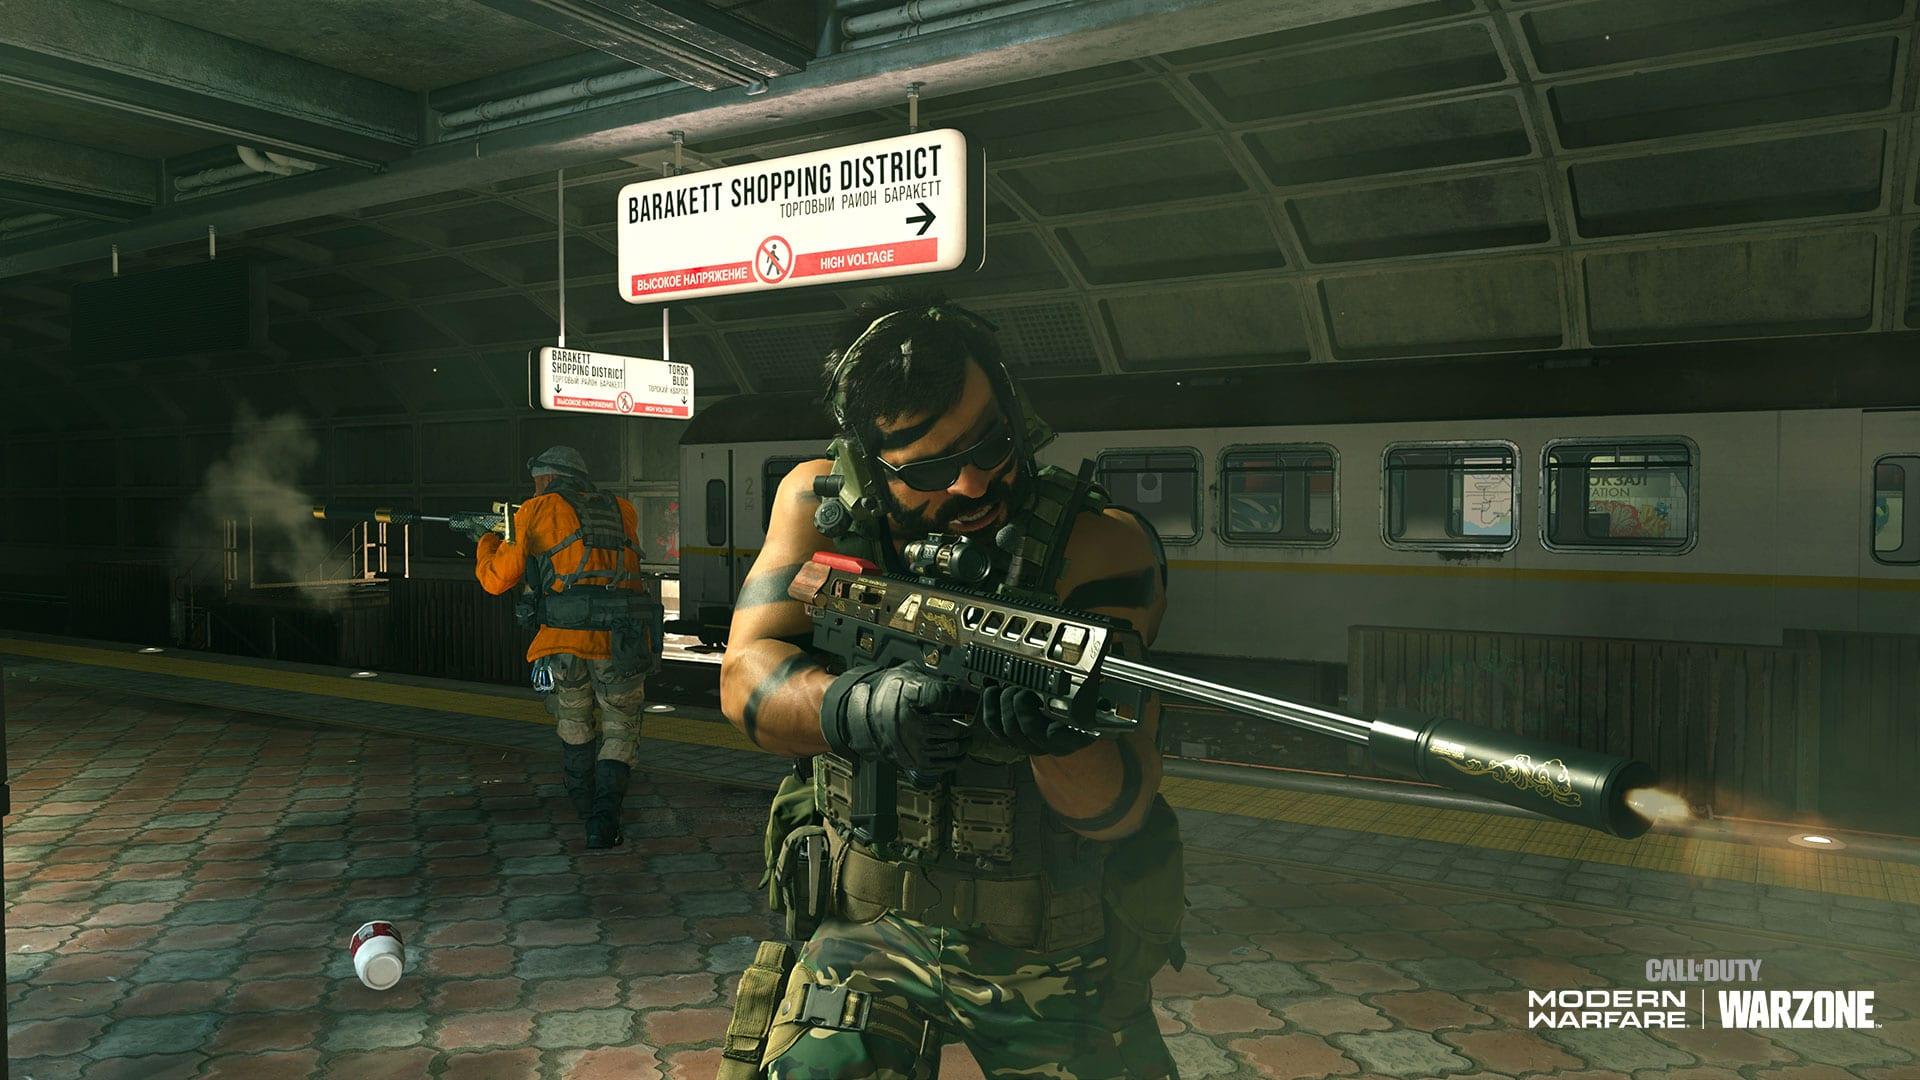 warzone subway system